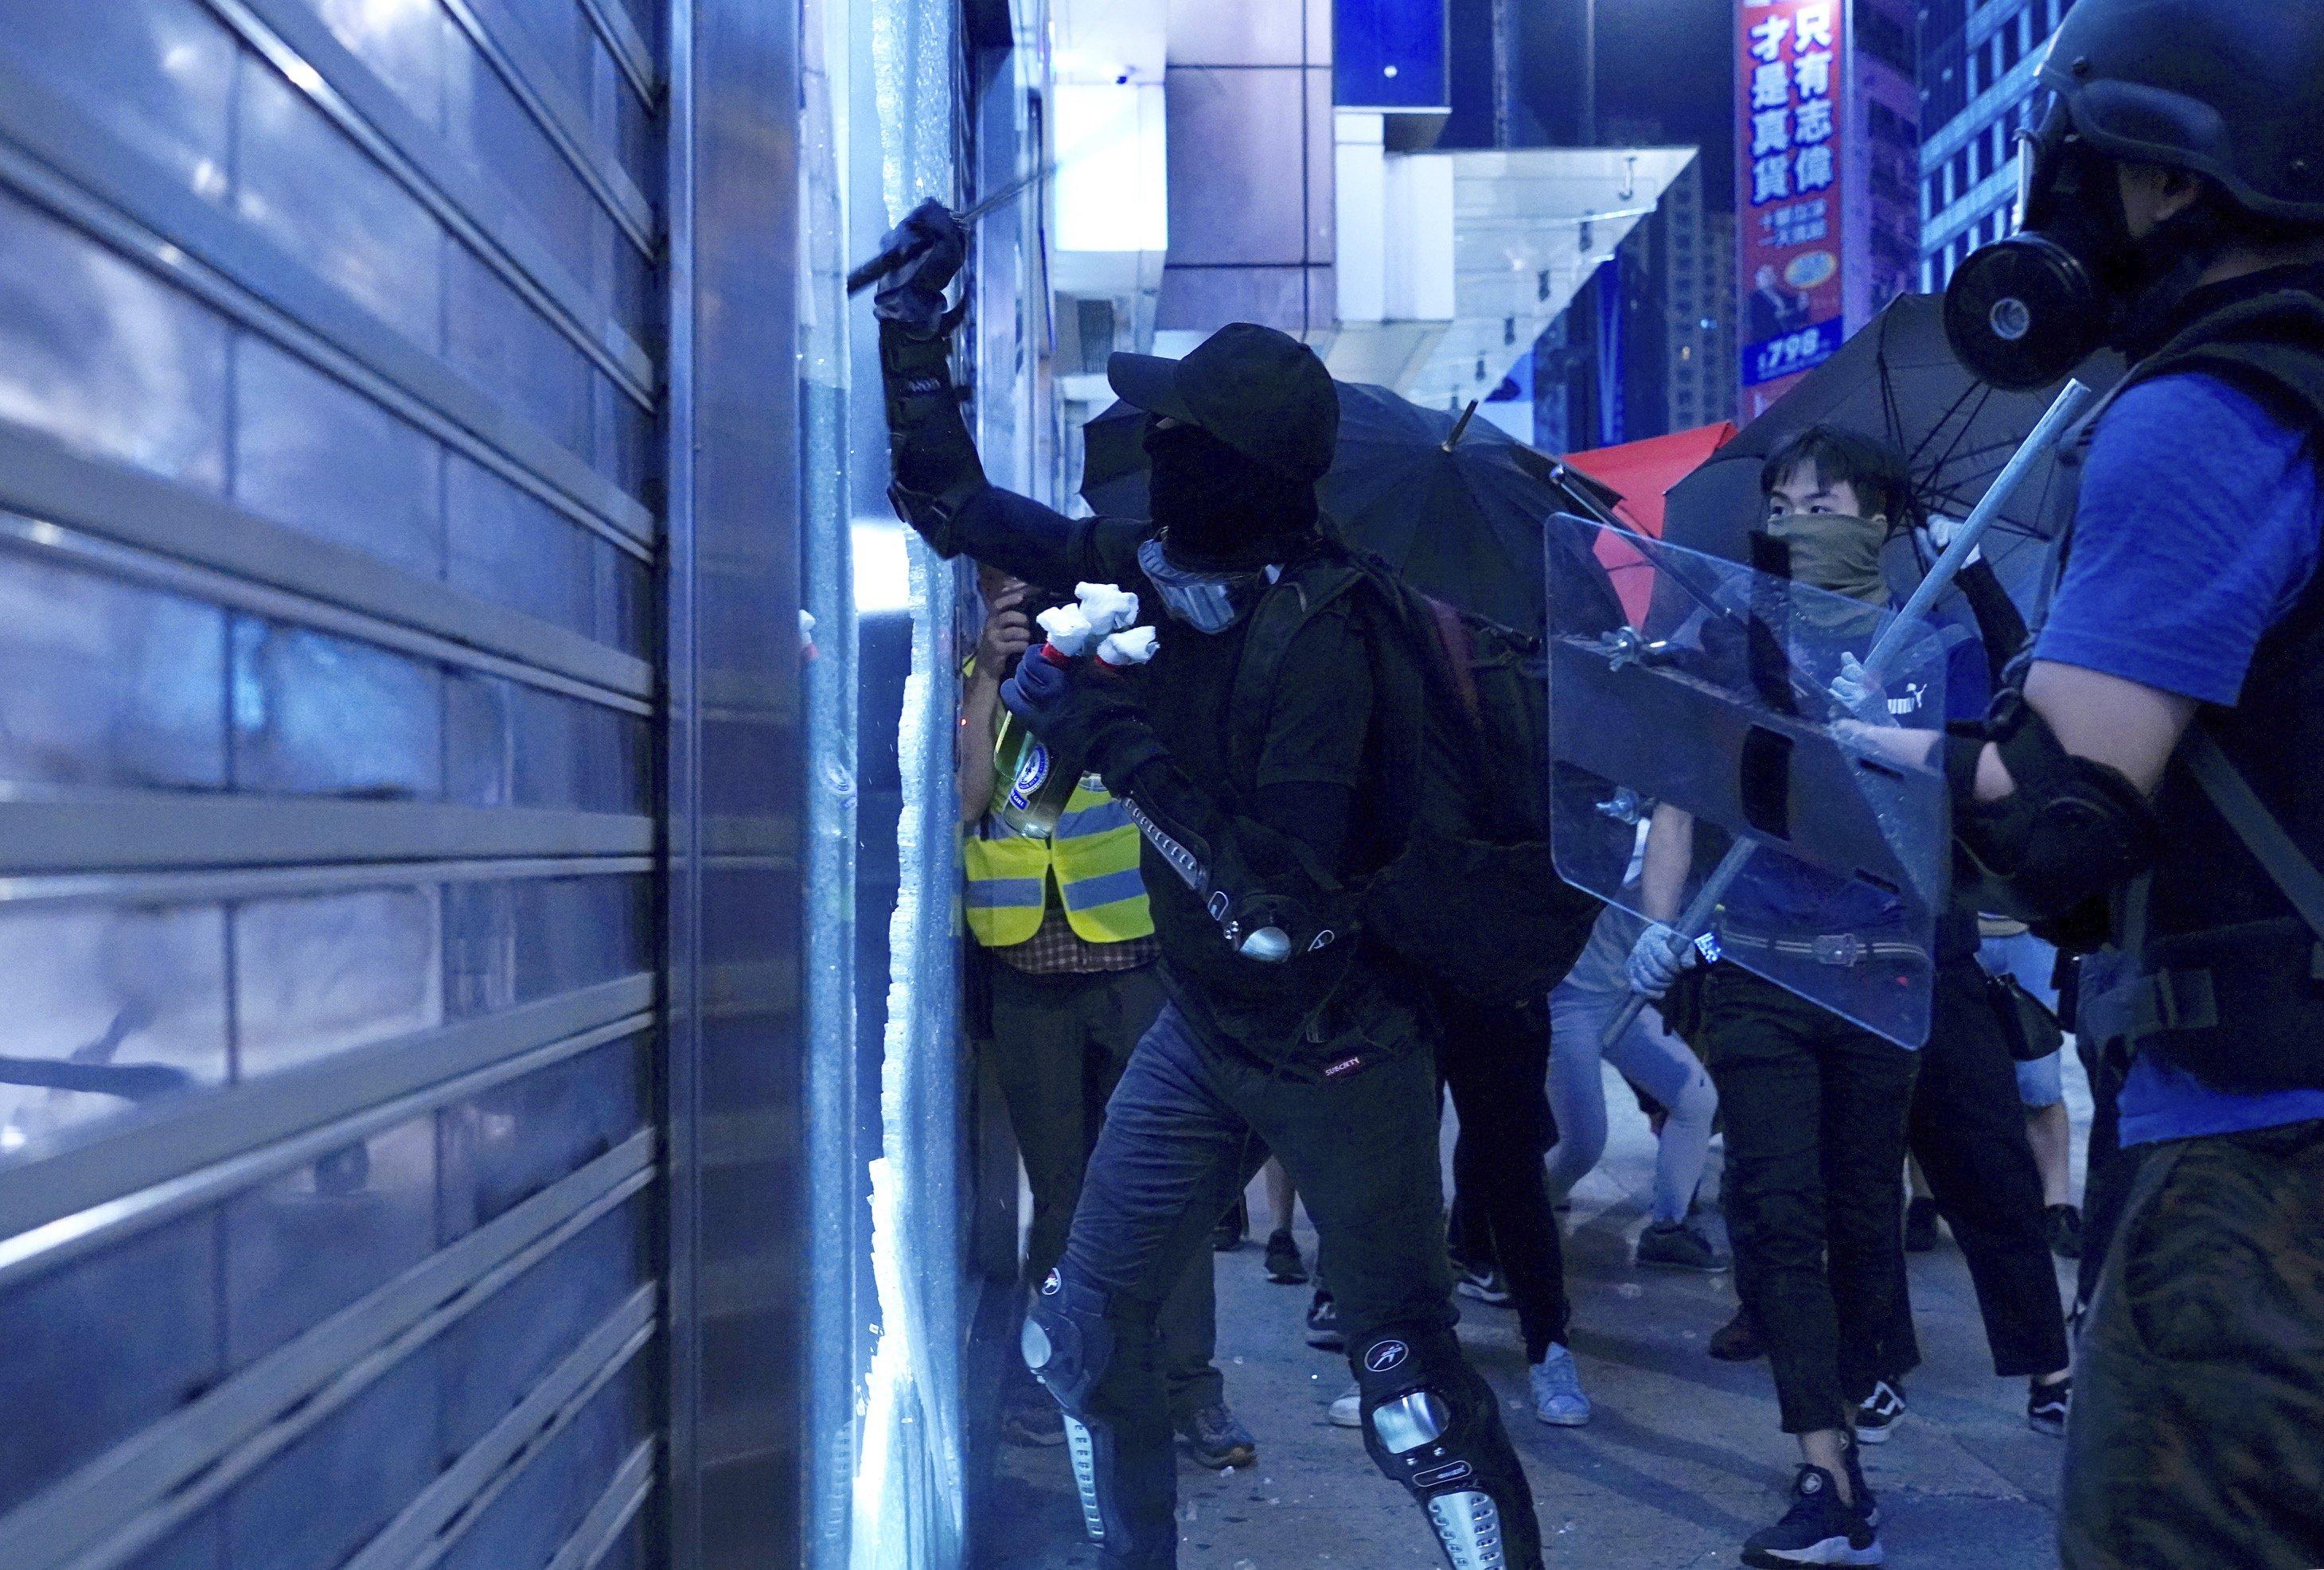 Hong Kong's leader says mask ban necessary to quell violence